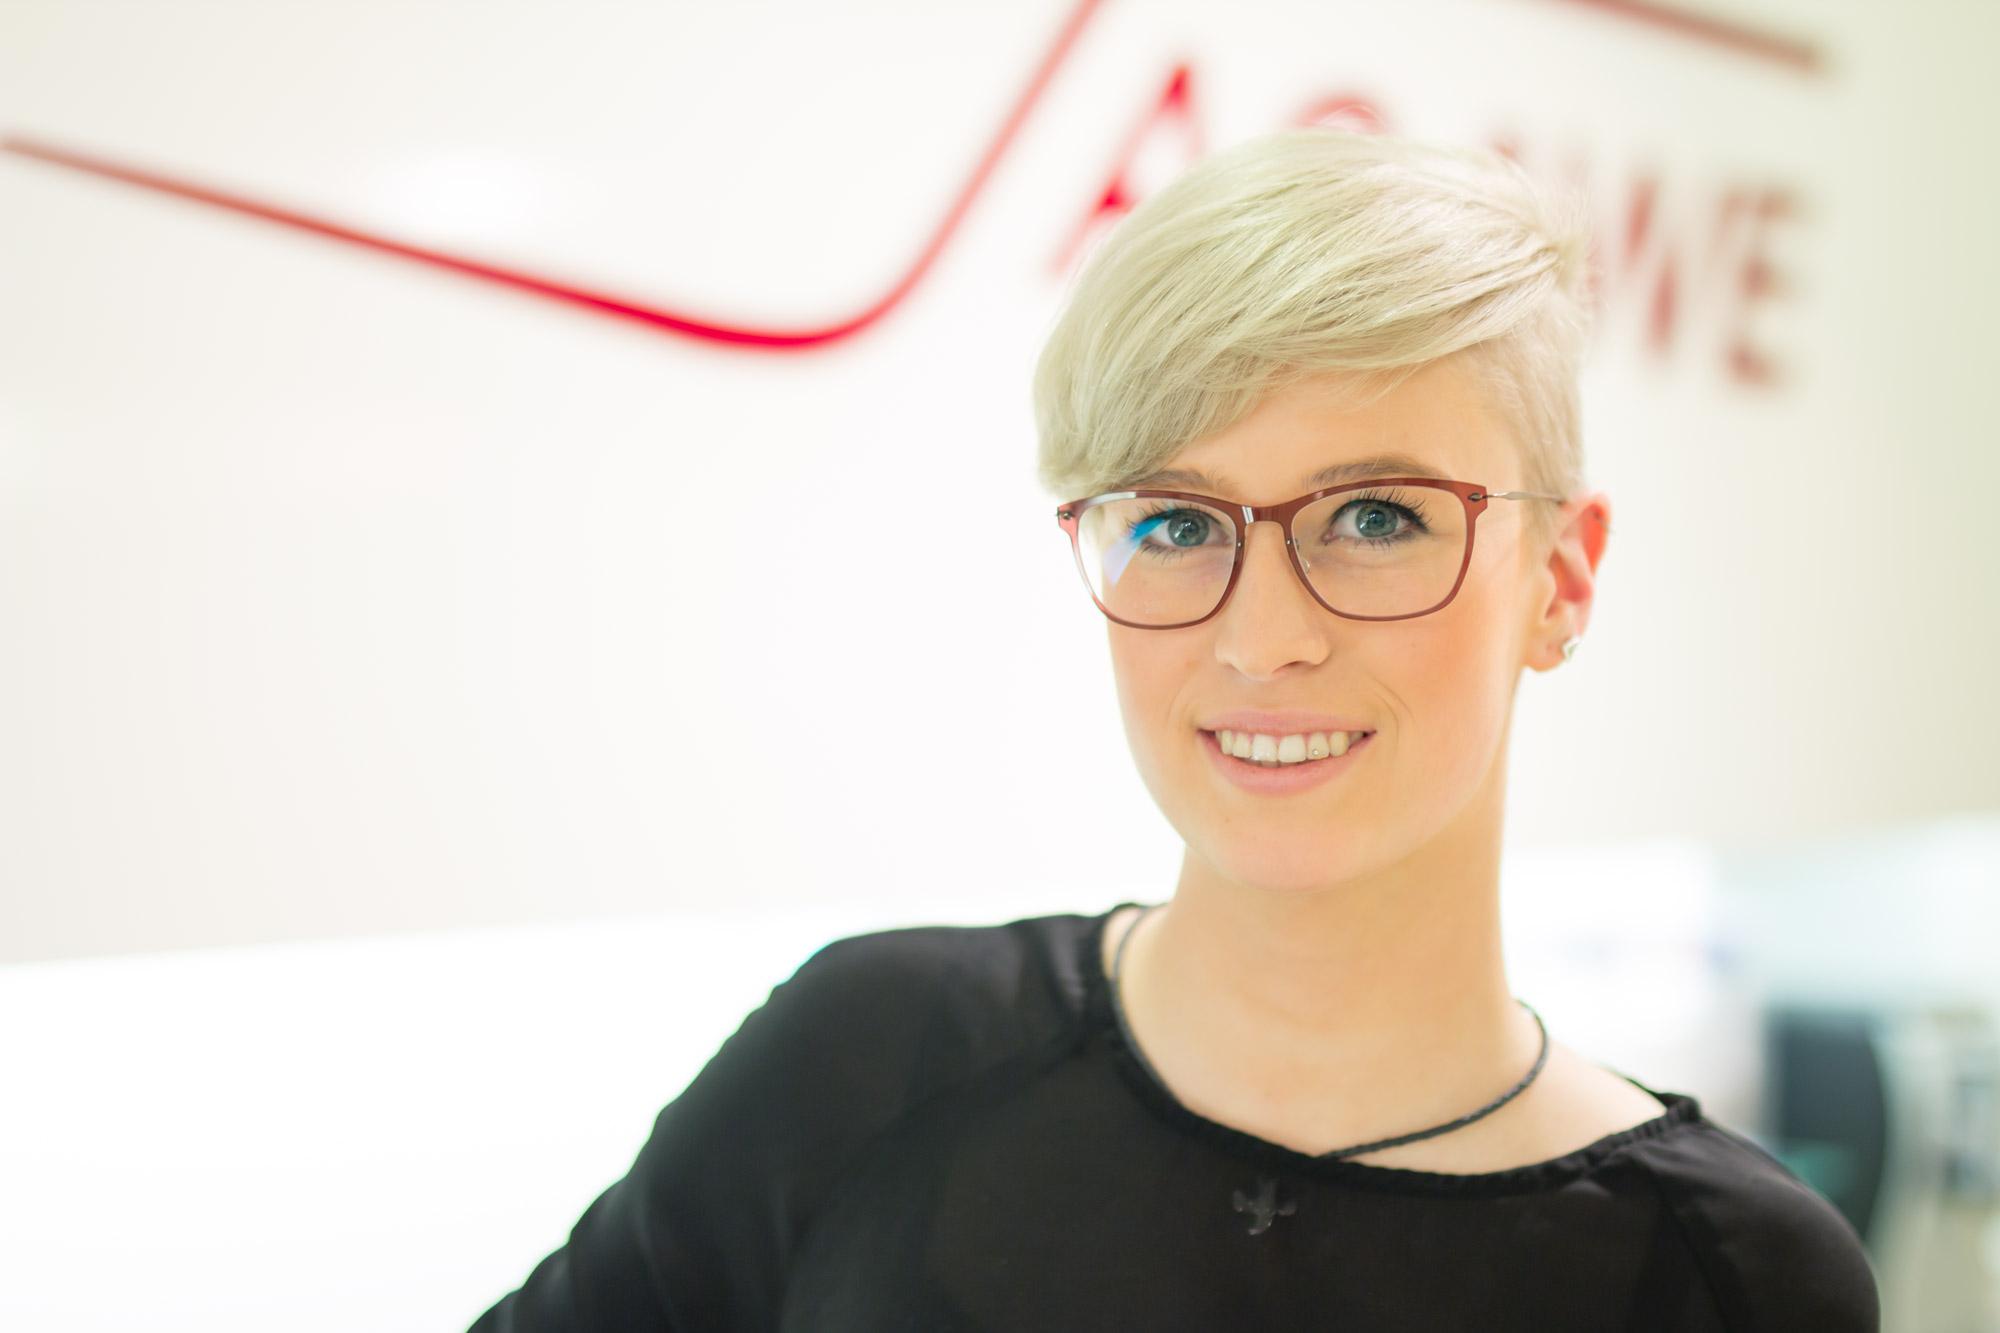 Pia Kraus ist Auszubildende der Augenoptik bei Optik Sagawe